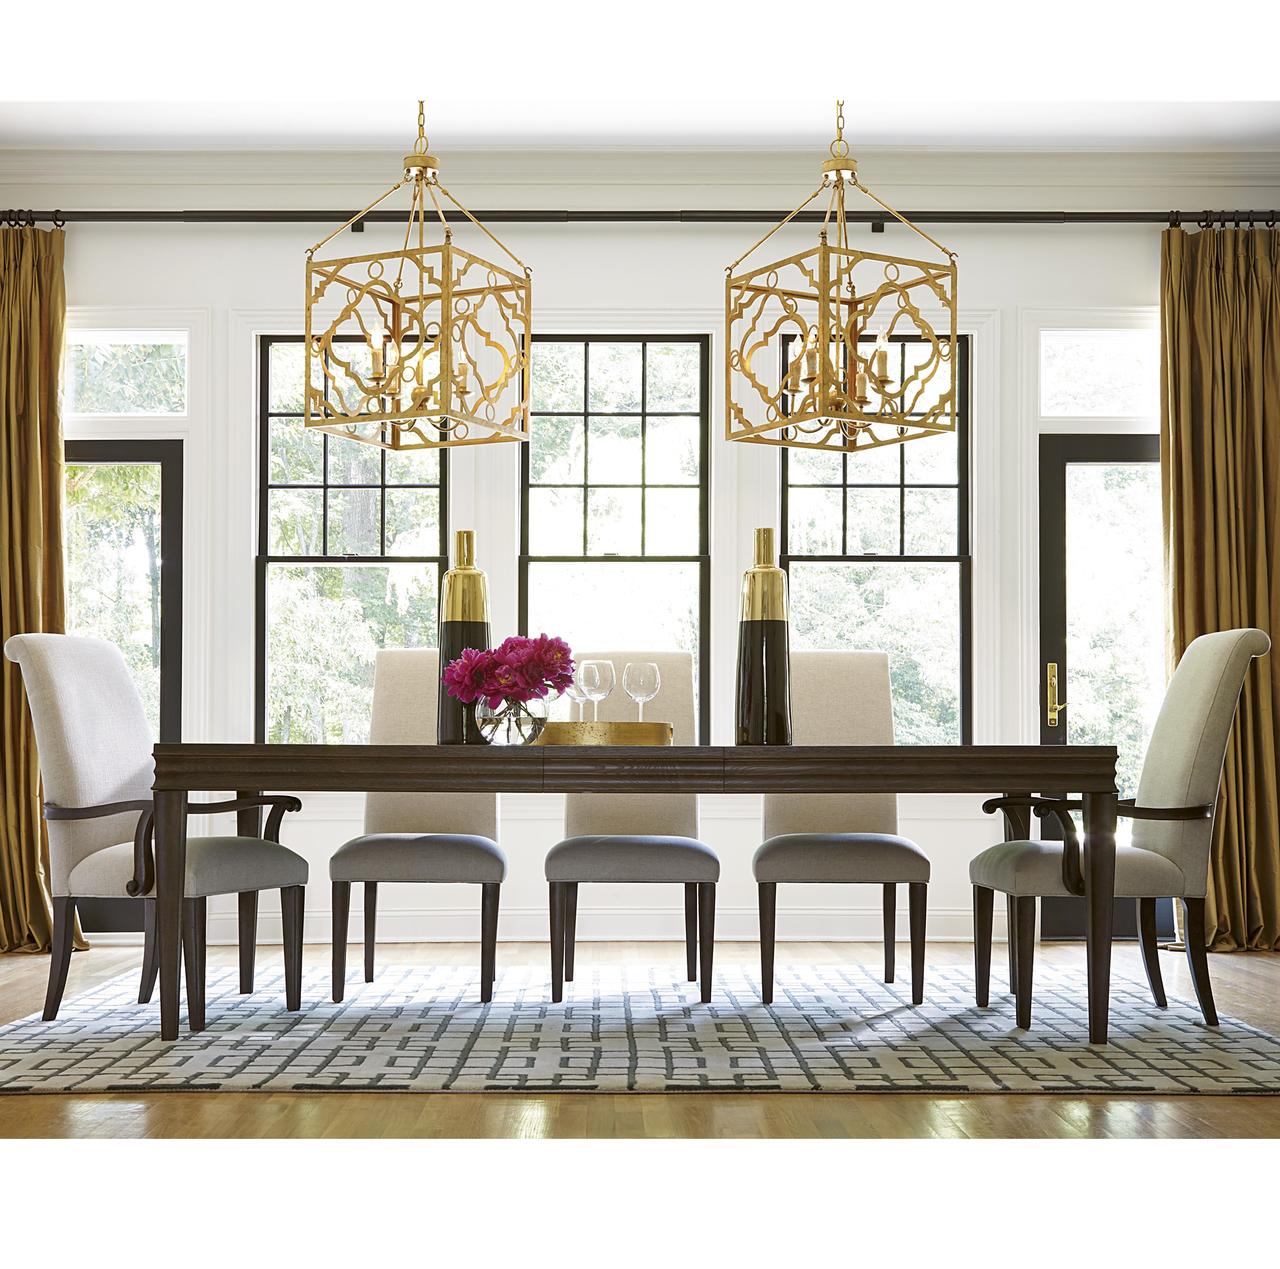 California Rustic Oak Extending 9 Piece Dining Room Set | Zin Home